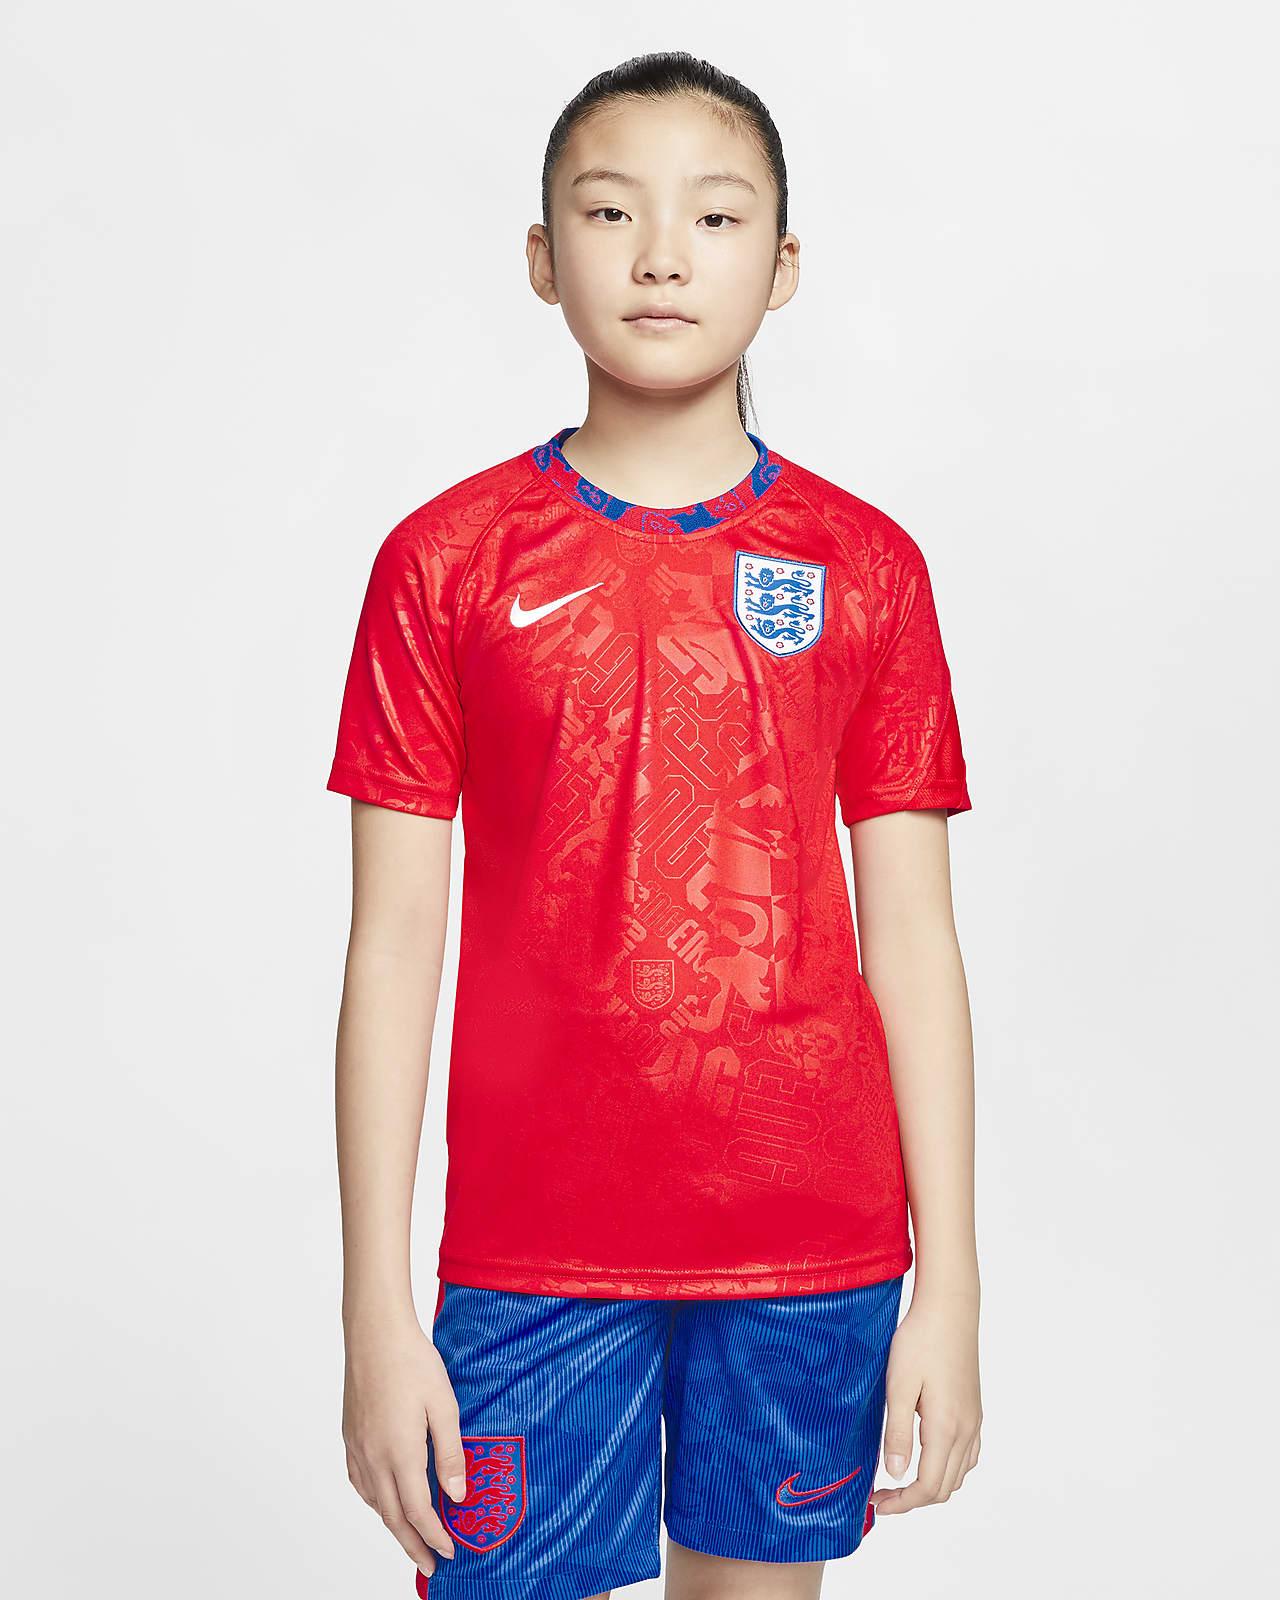 England Older Kids' Short-Sleeve Football Top